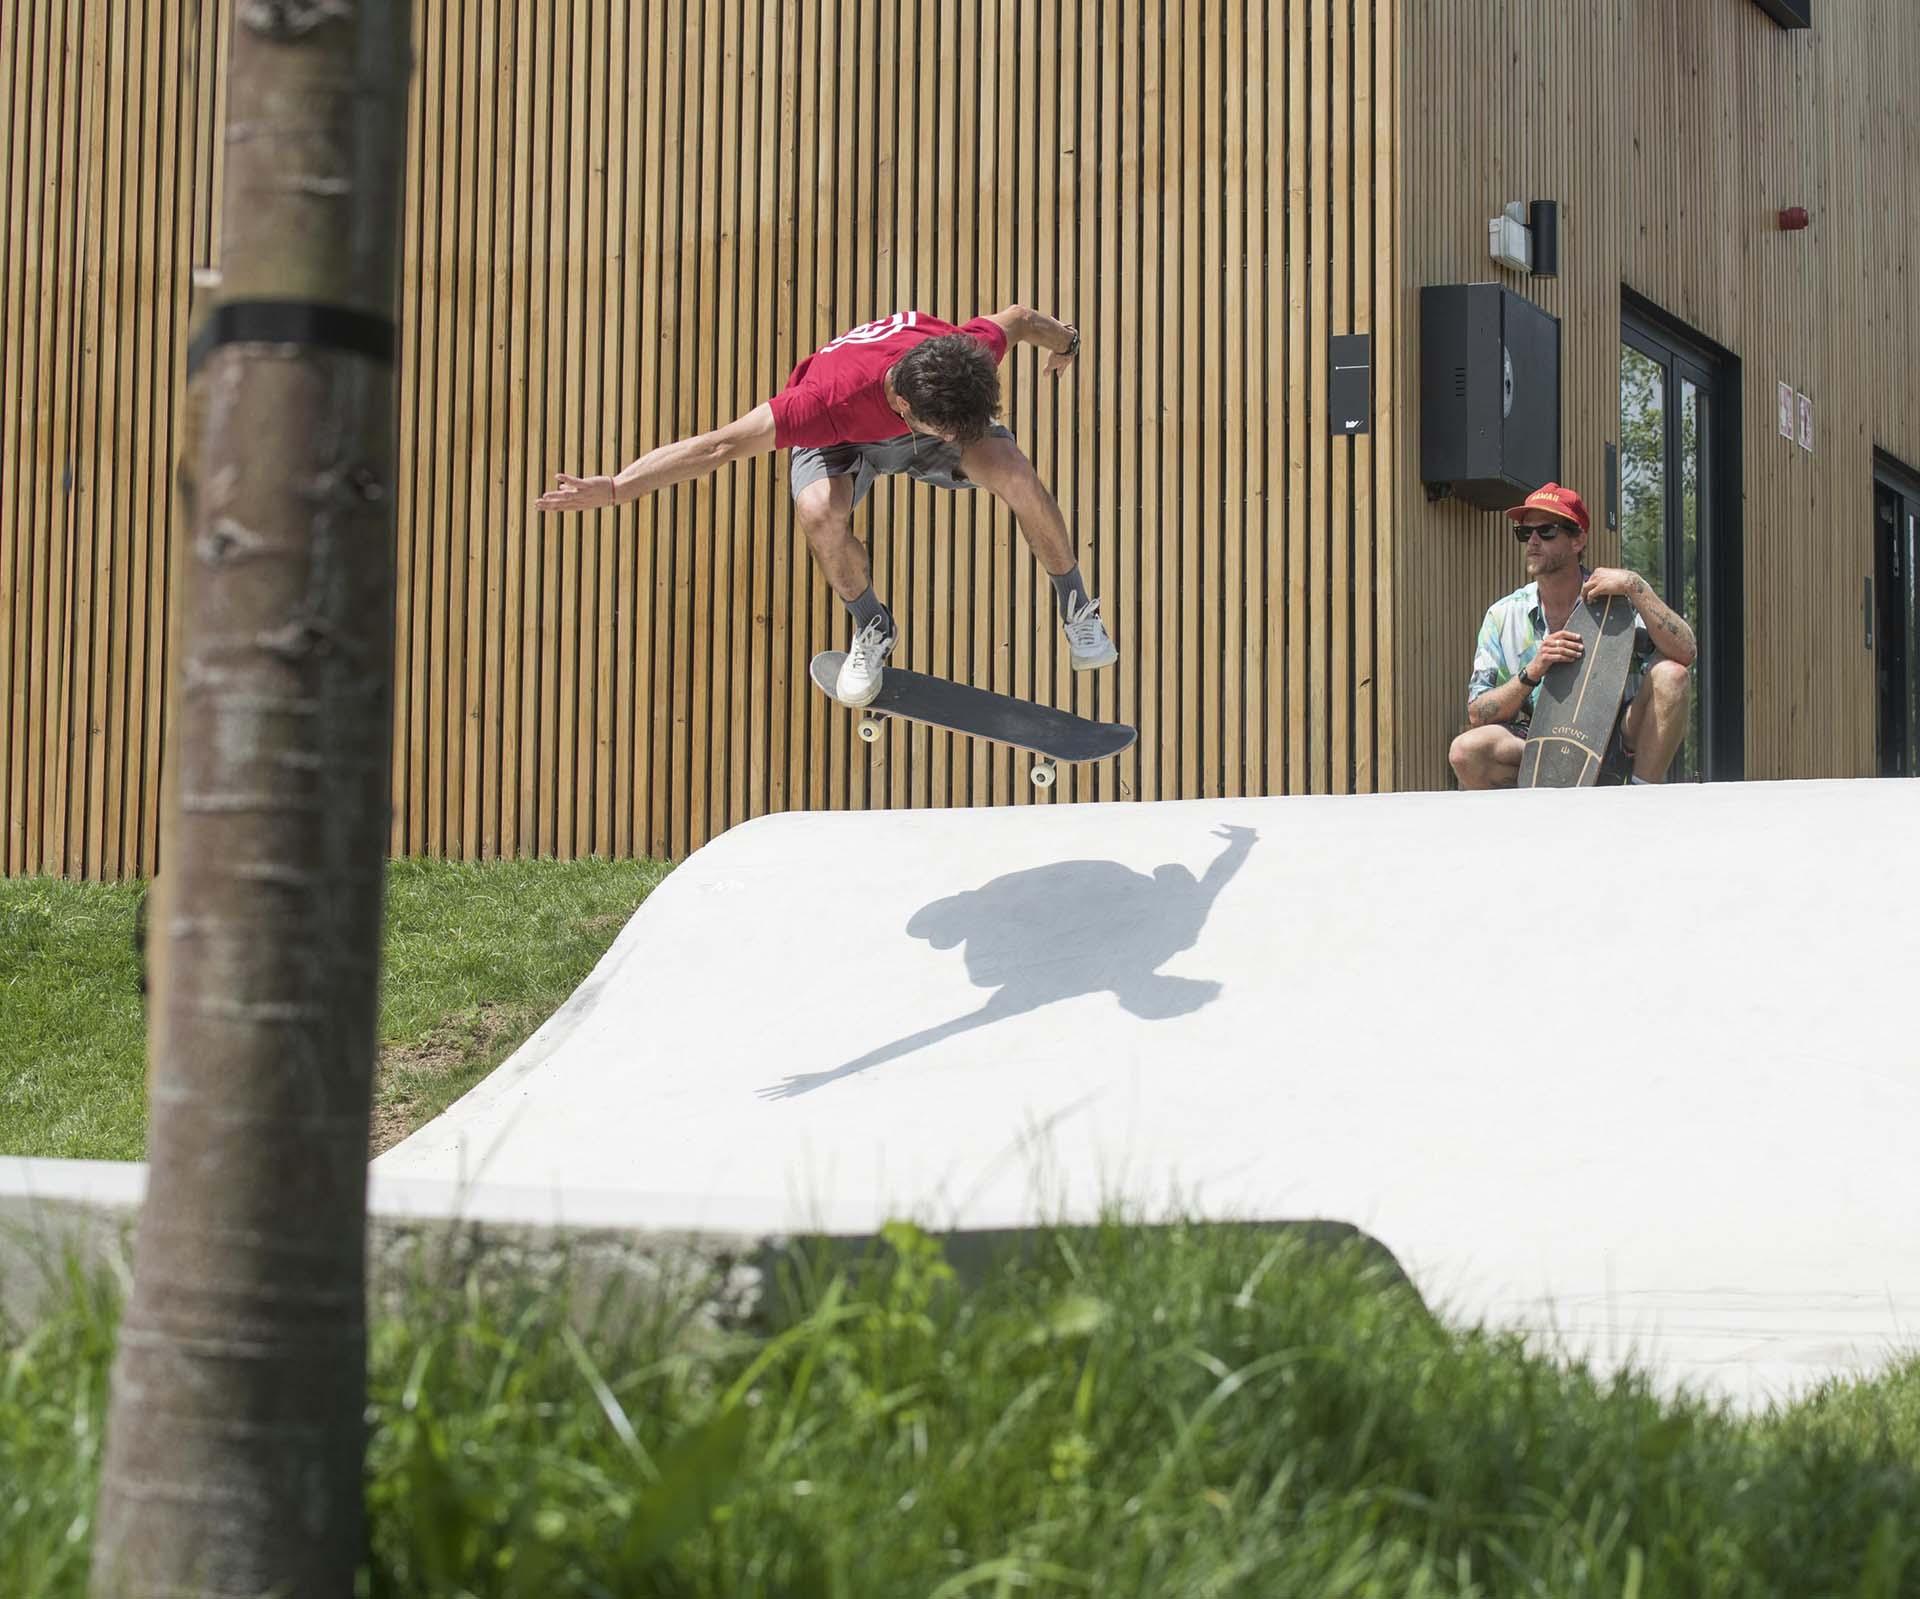 Cursos de skate en Moana Surf camp Bilbao